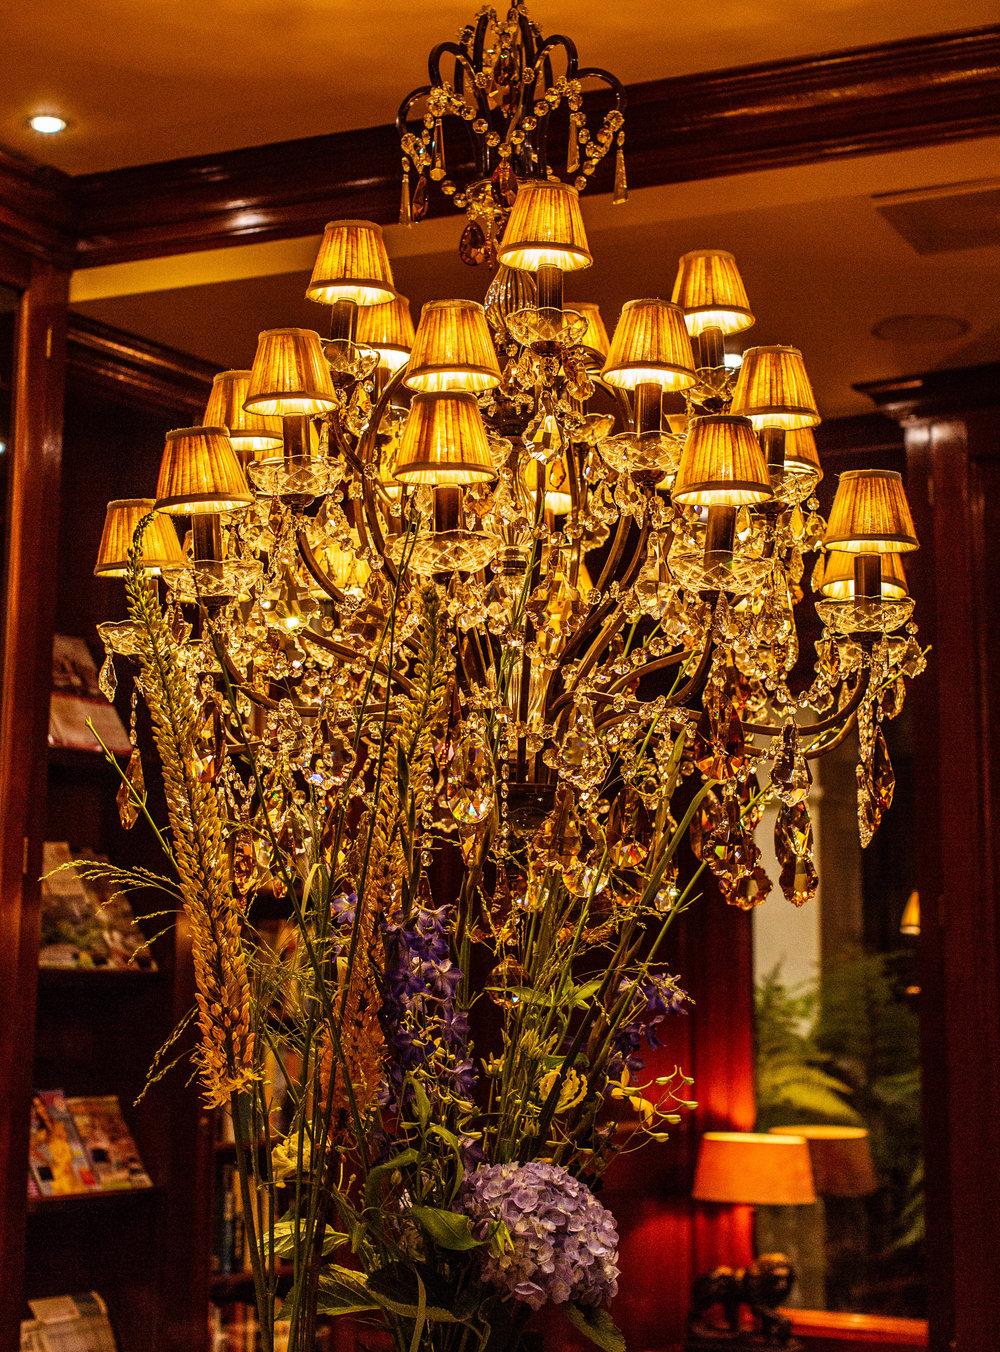 hotel chandelier 2 (1 of 1).jpg